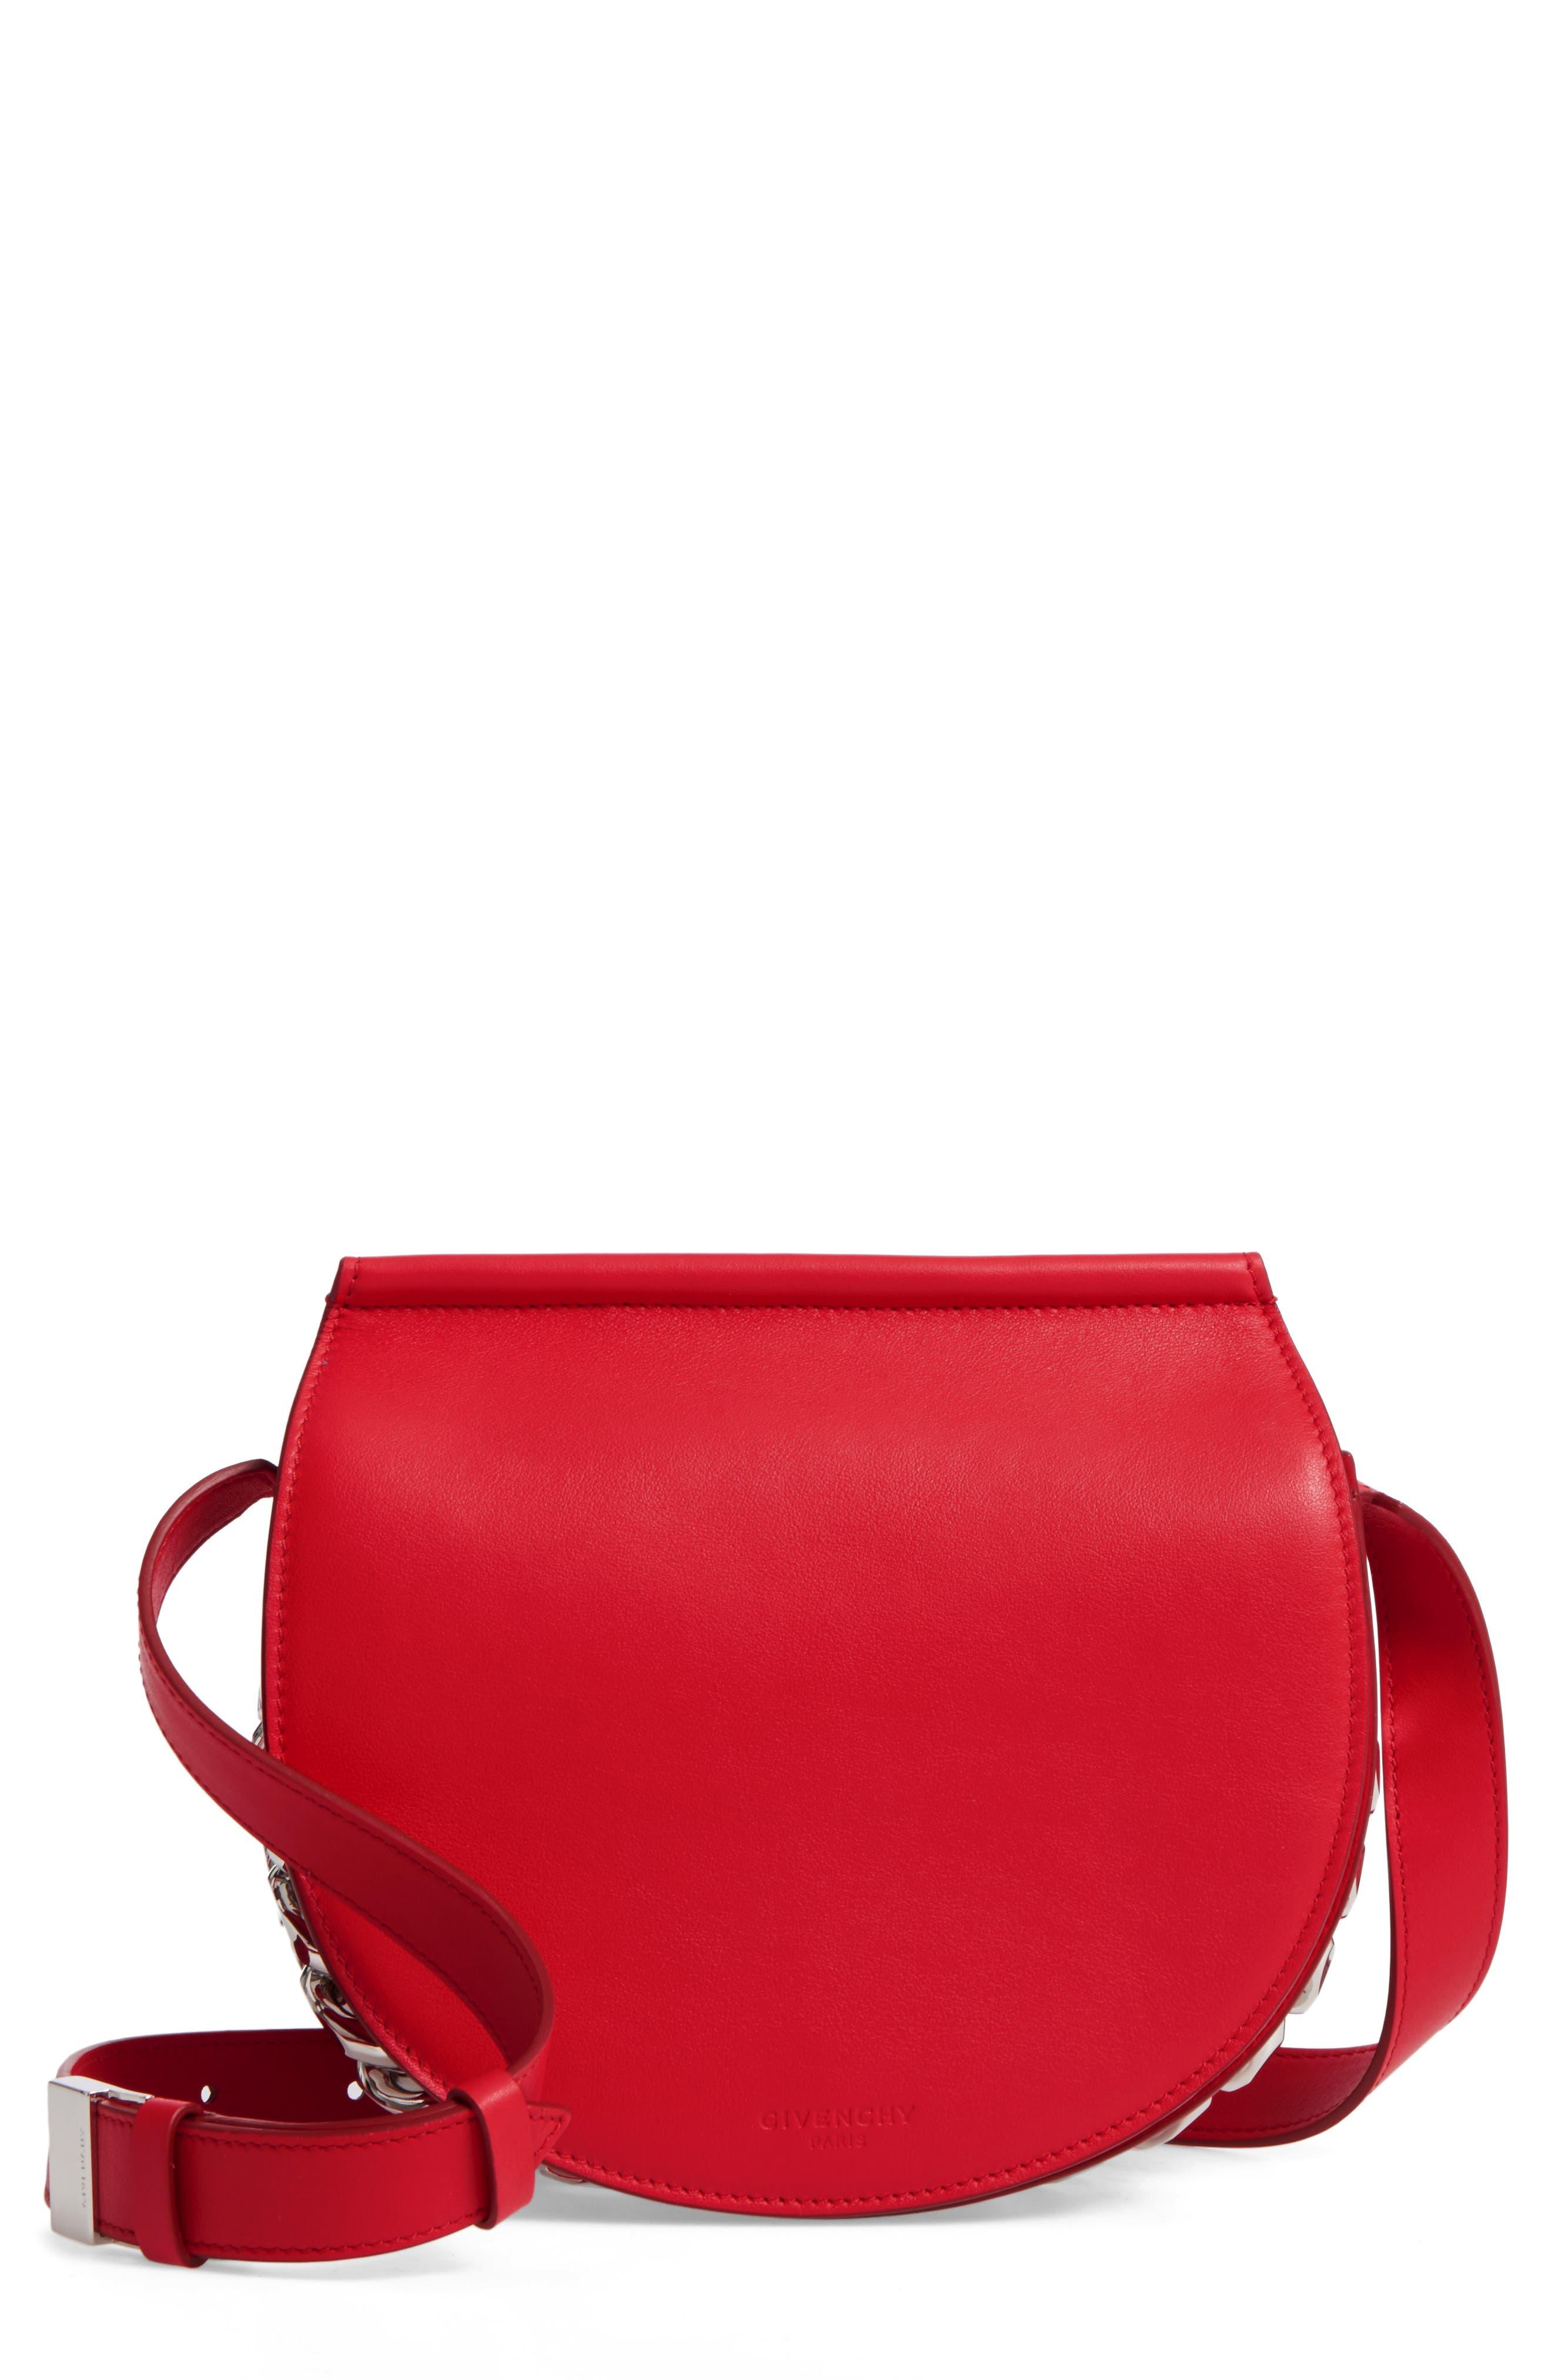 Givenchy Mini Infinity Calfskin Leather Saddle Bag